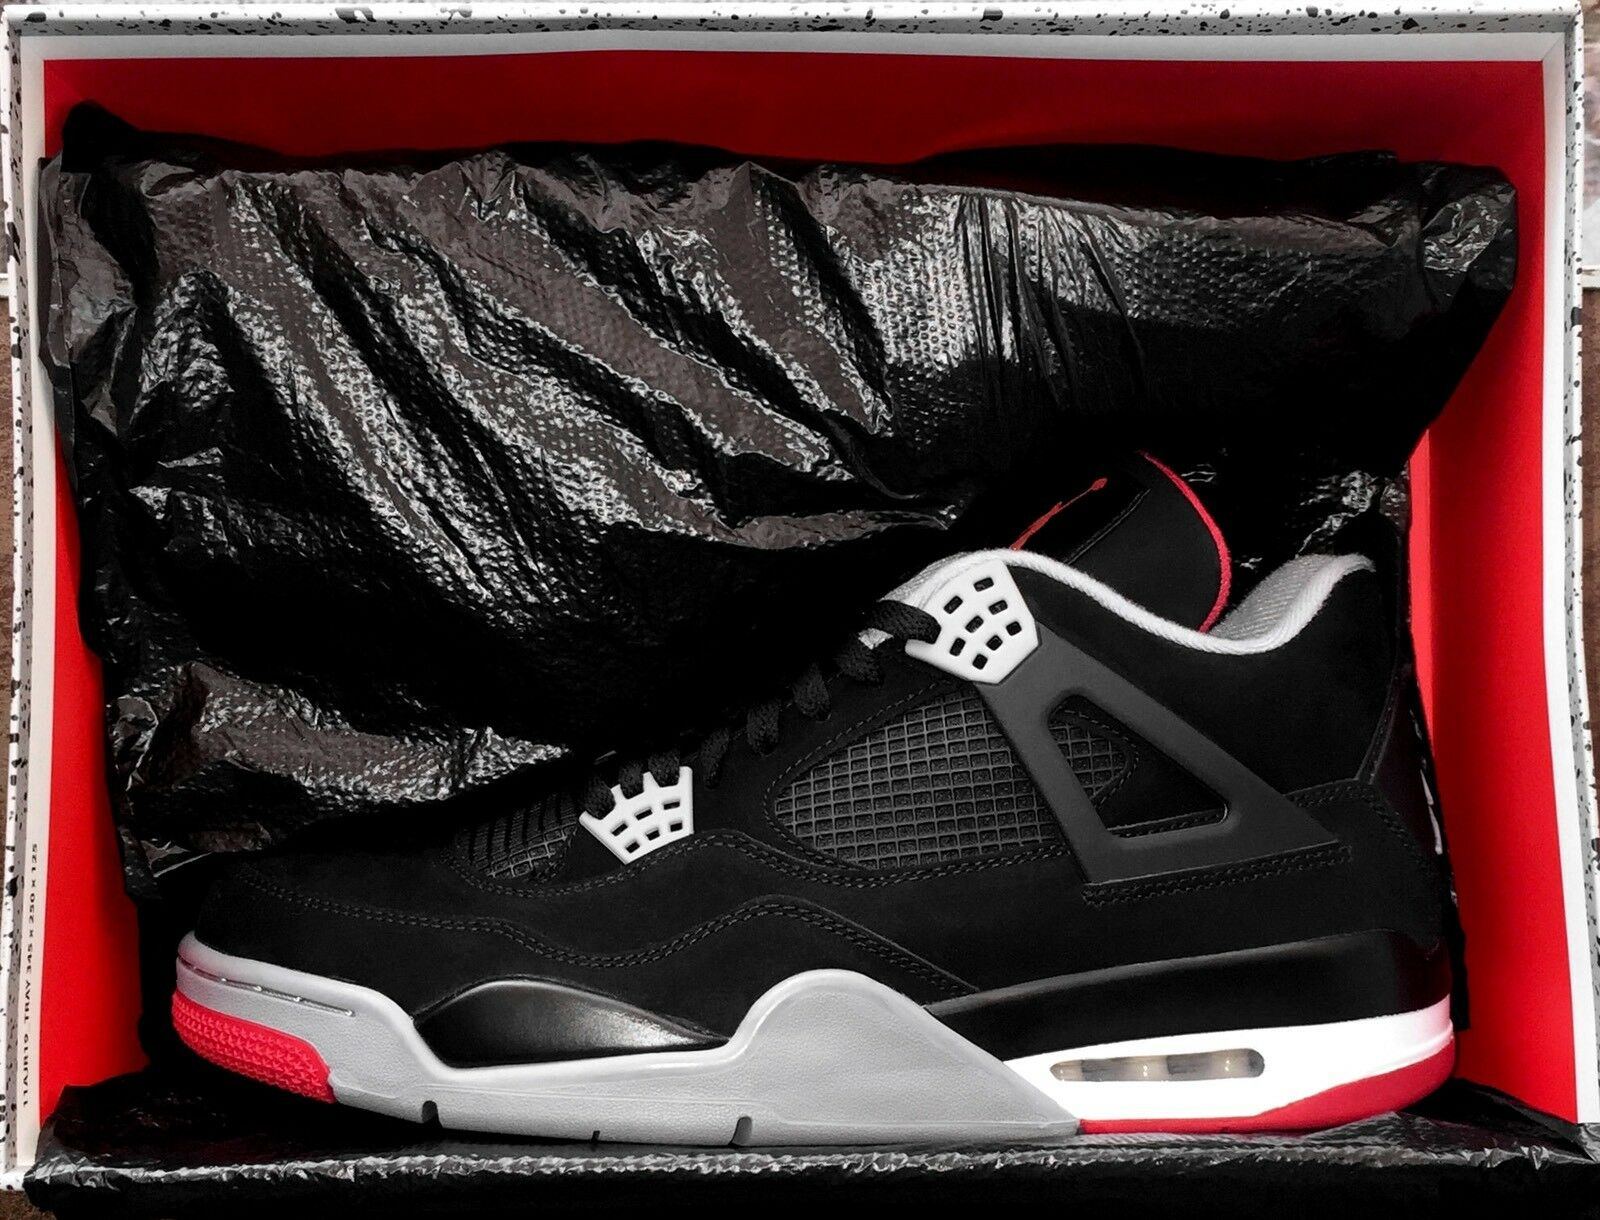 Nike Cemento Air Jordan 4 Retro Cemento Nike Negro Bred Blanco taxi Toe Levis og 1 3 11 14baff